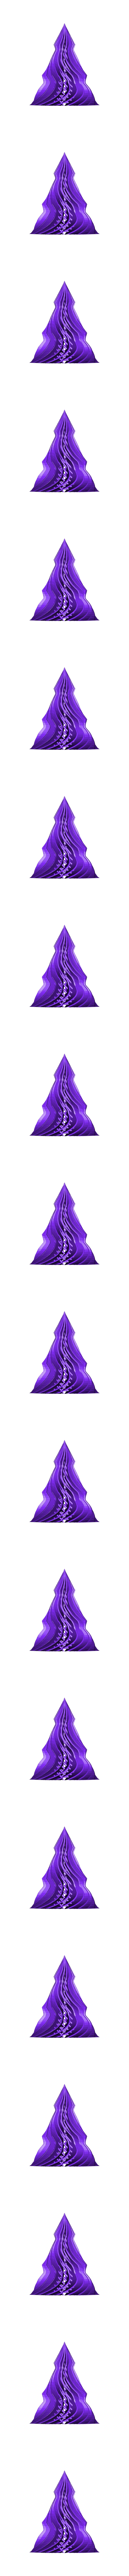 Original_-_small_size.stl Download free STL file Christmas tree idea FIXED • 3D printer model, Gophy